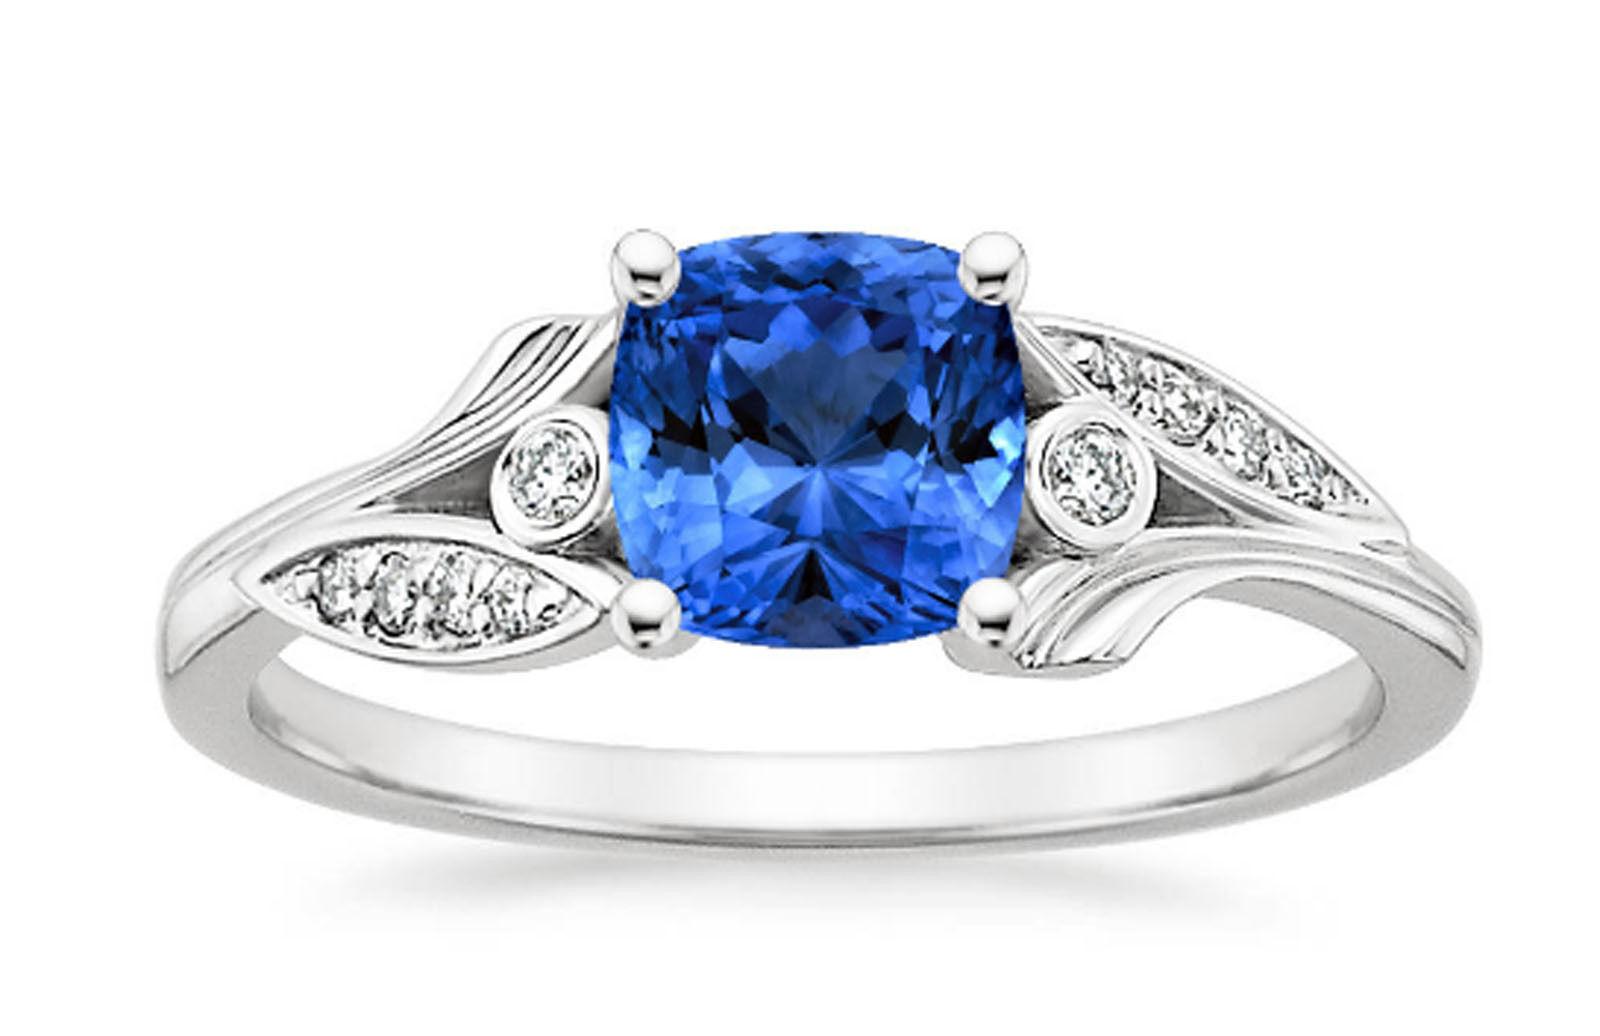 1.75 Ct Natural Sapphire Gemstone Diamond Engagement Rings 14K White gold Offer